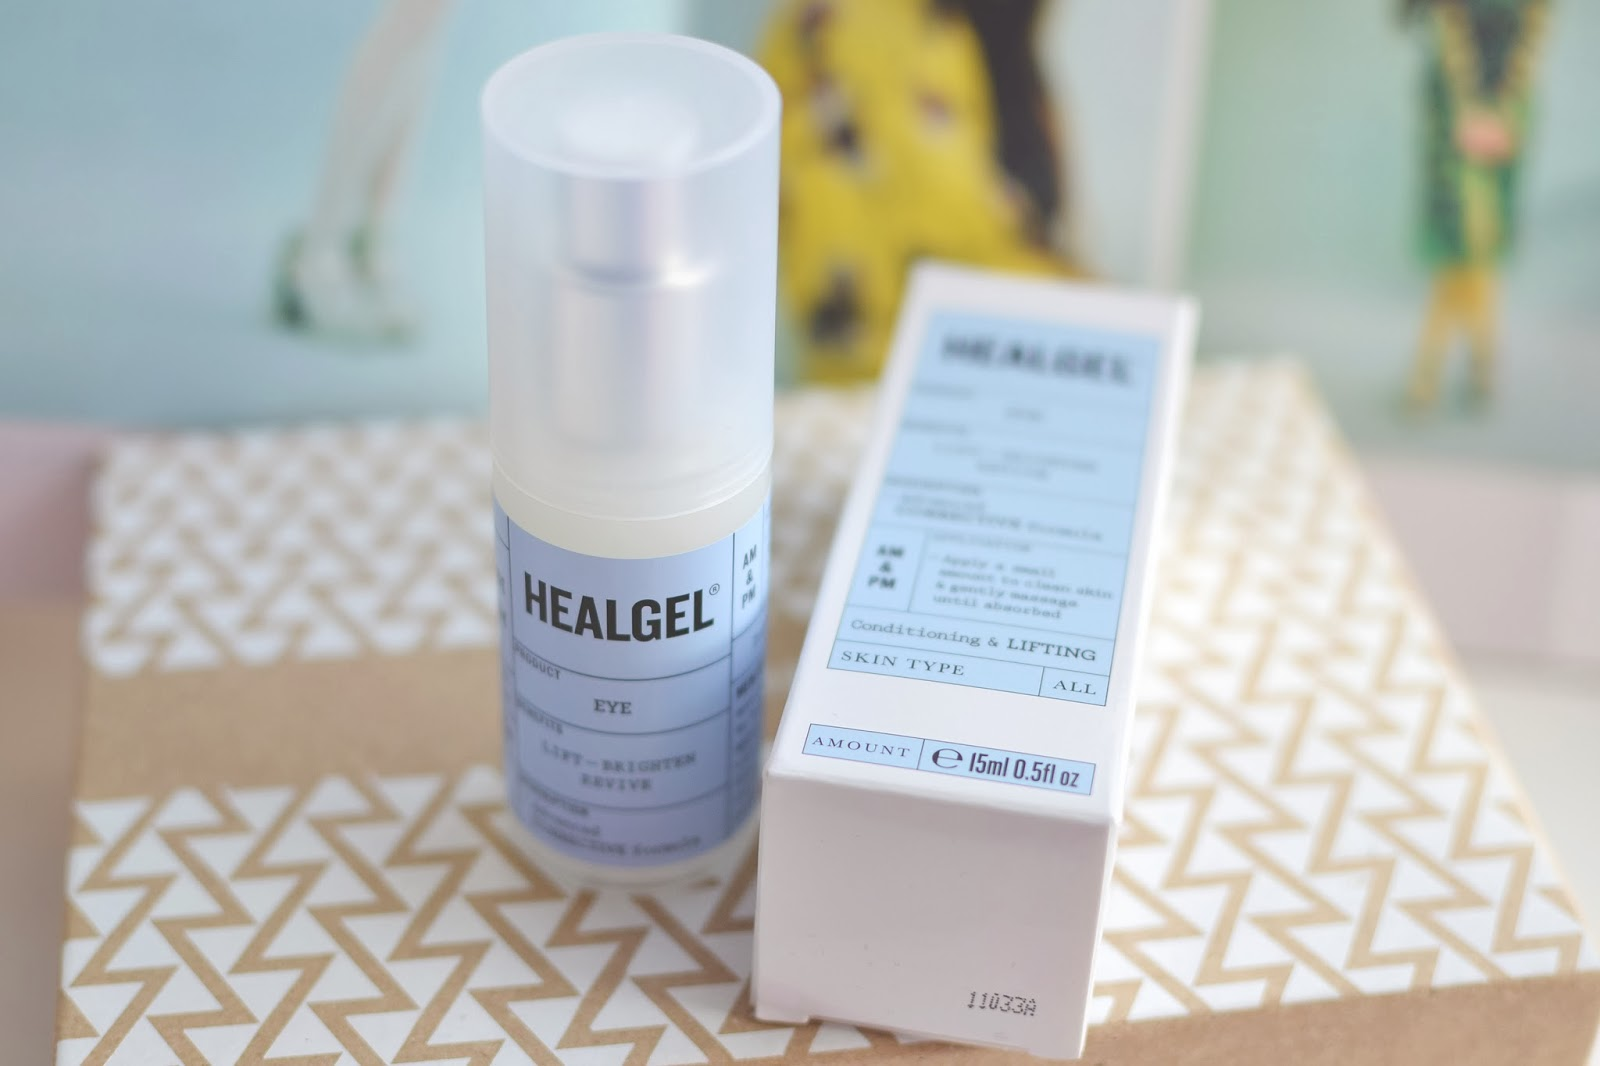 healgel eye review, best affordable eye cream